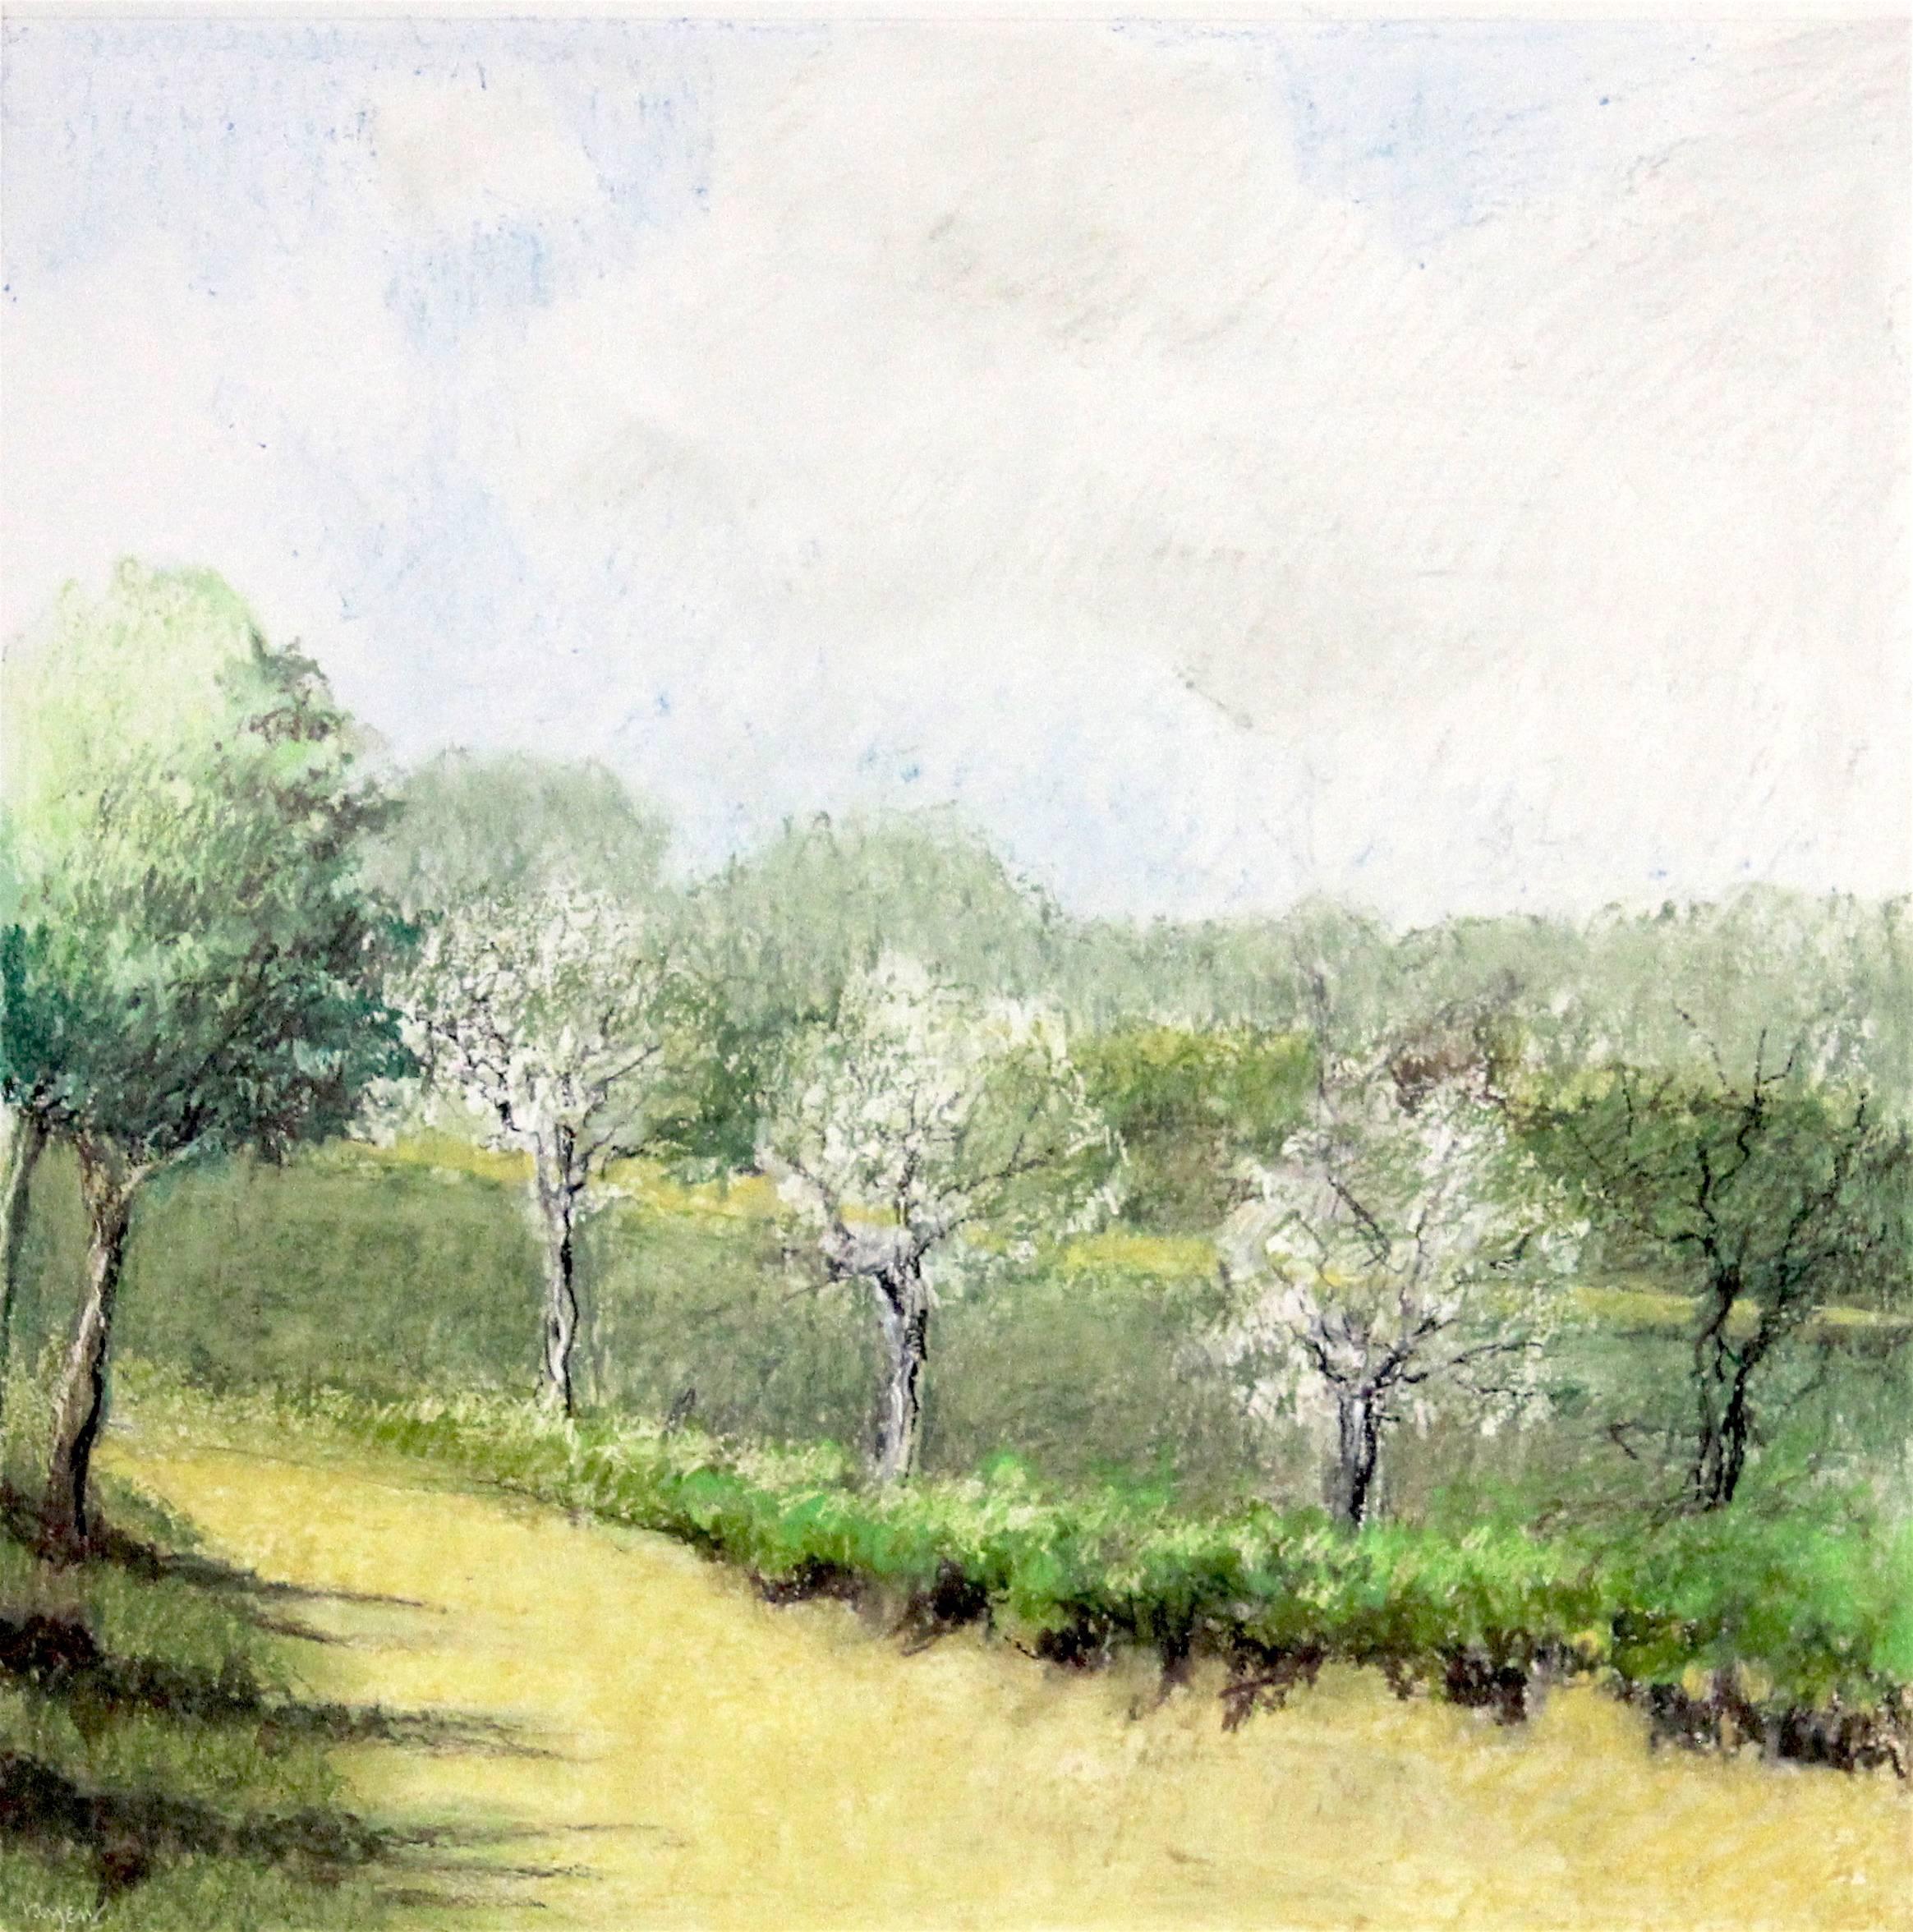 """Untitled Pastel #11"", pastel drawing, landscape, trees, spring, summer, green"